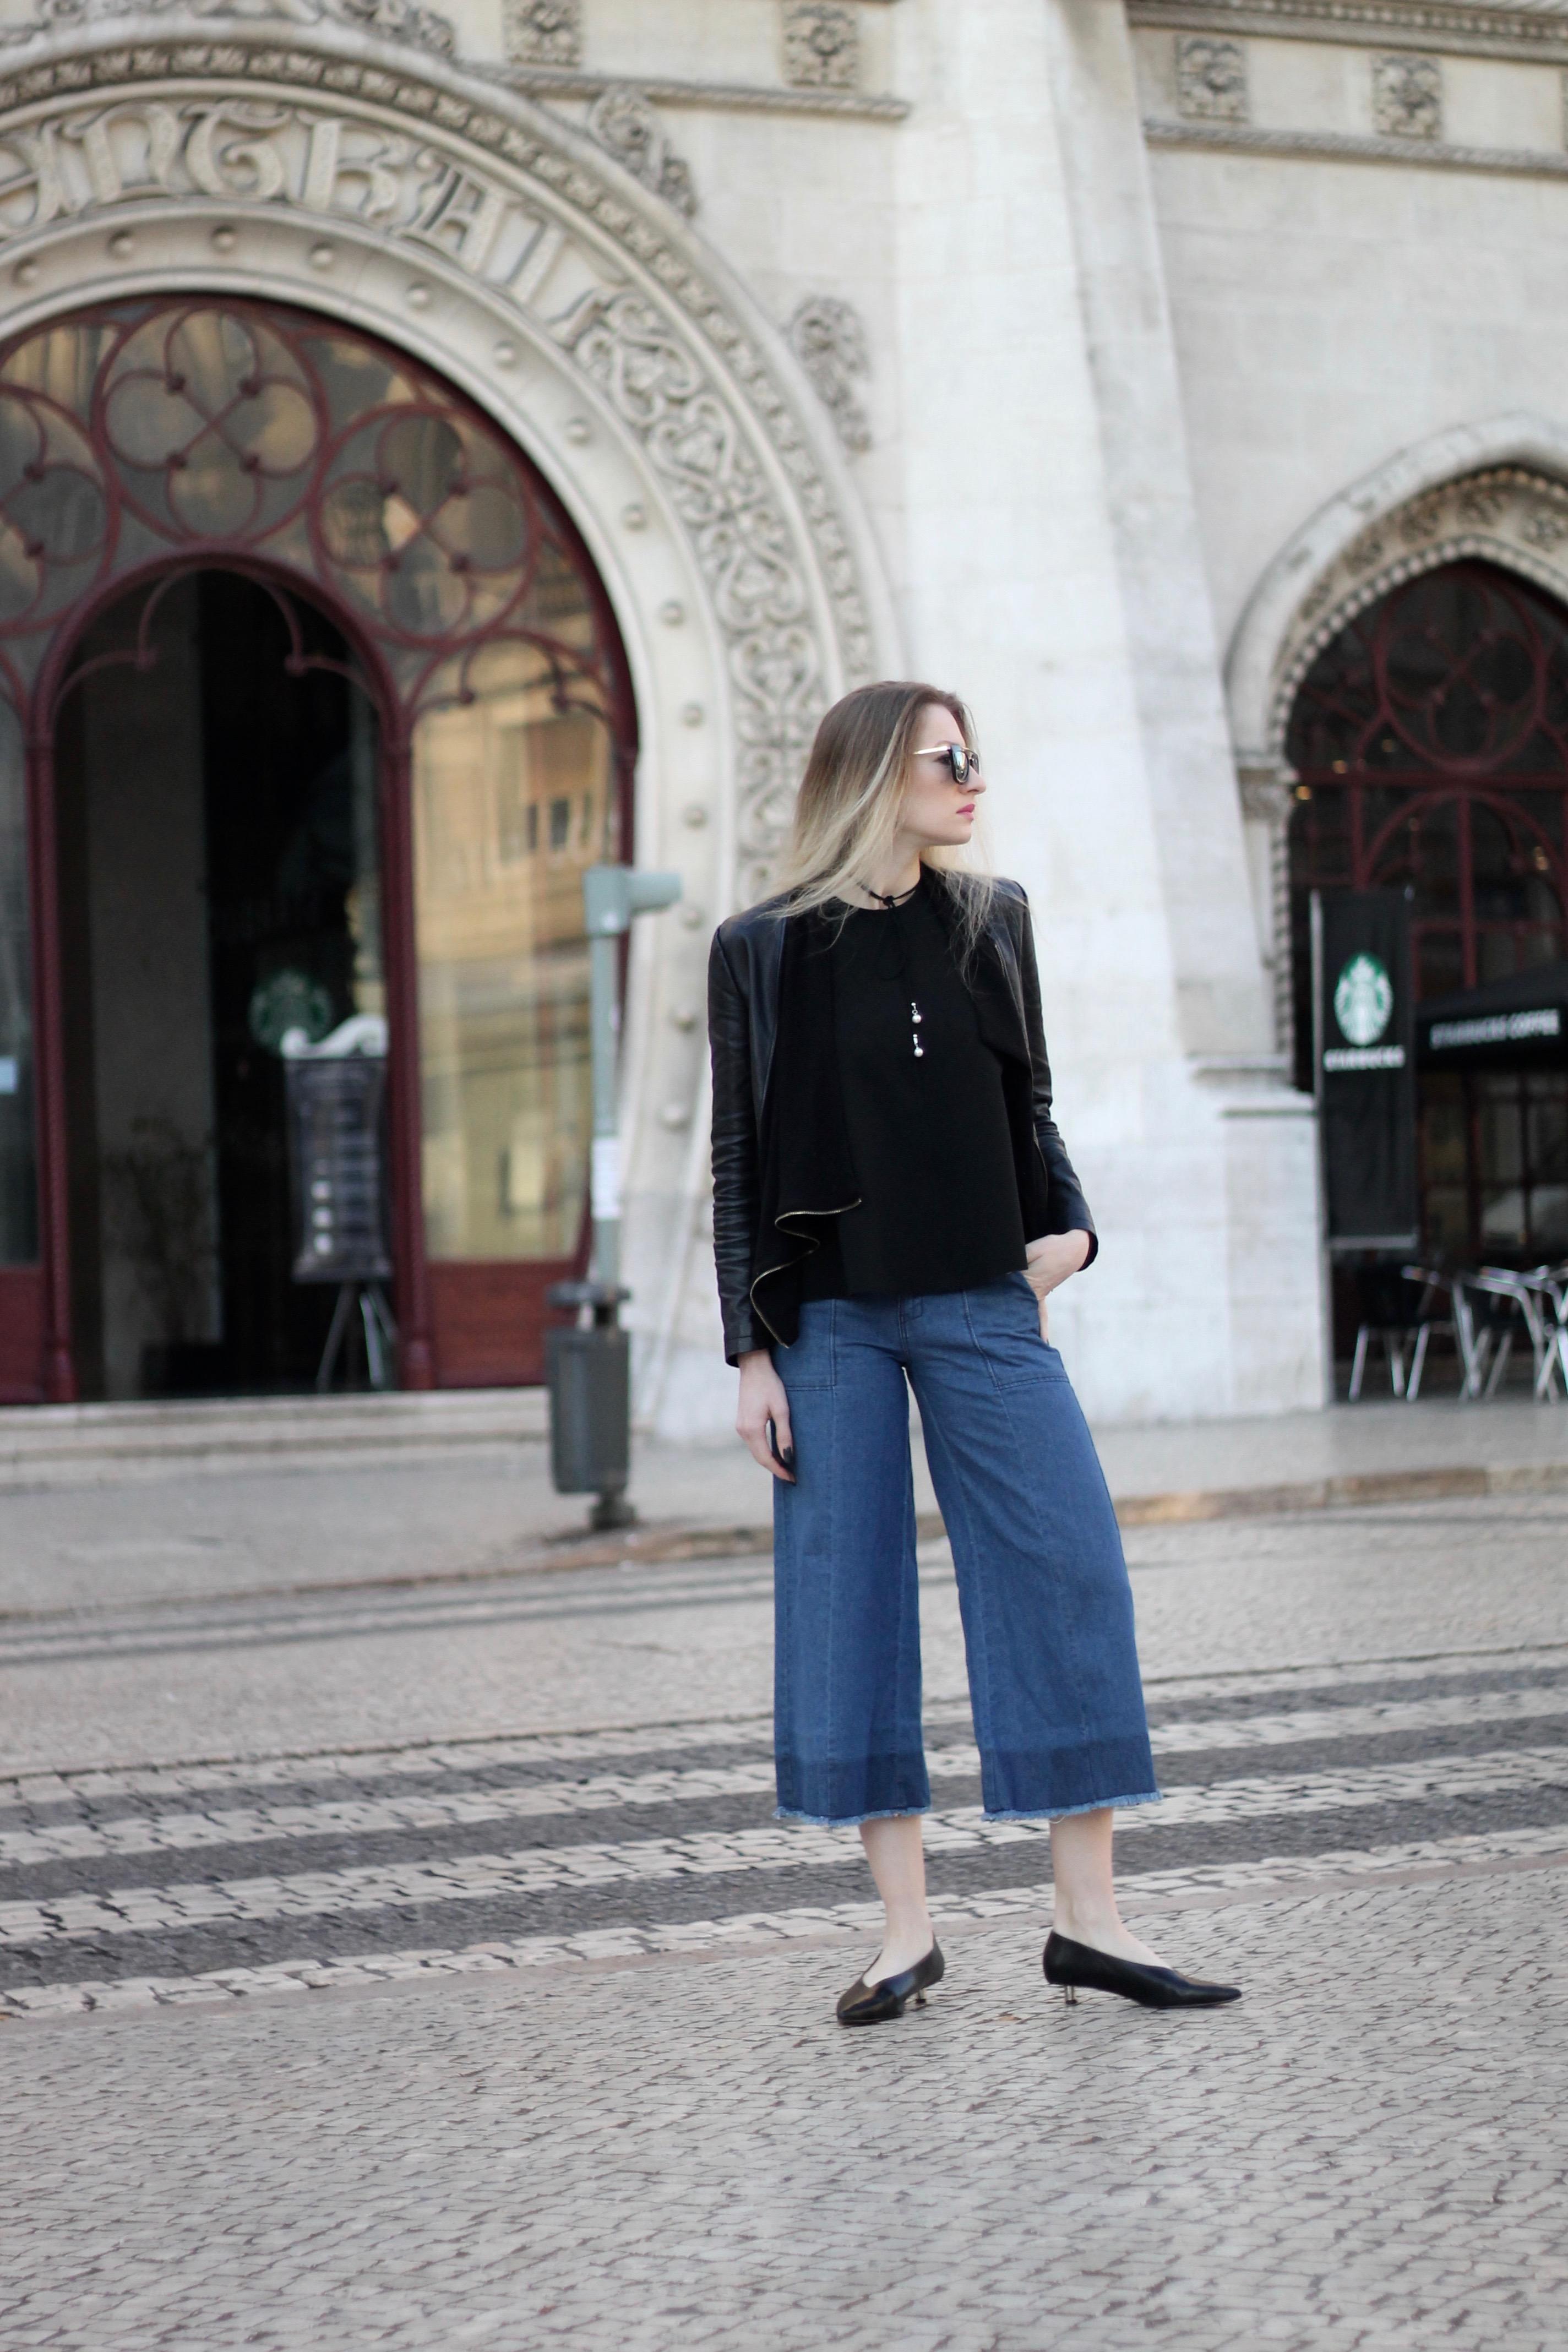 MON MODE / Fashion Blogger / Denim Culottes / Lisbon, Portugal